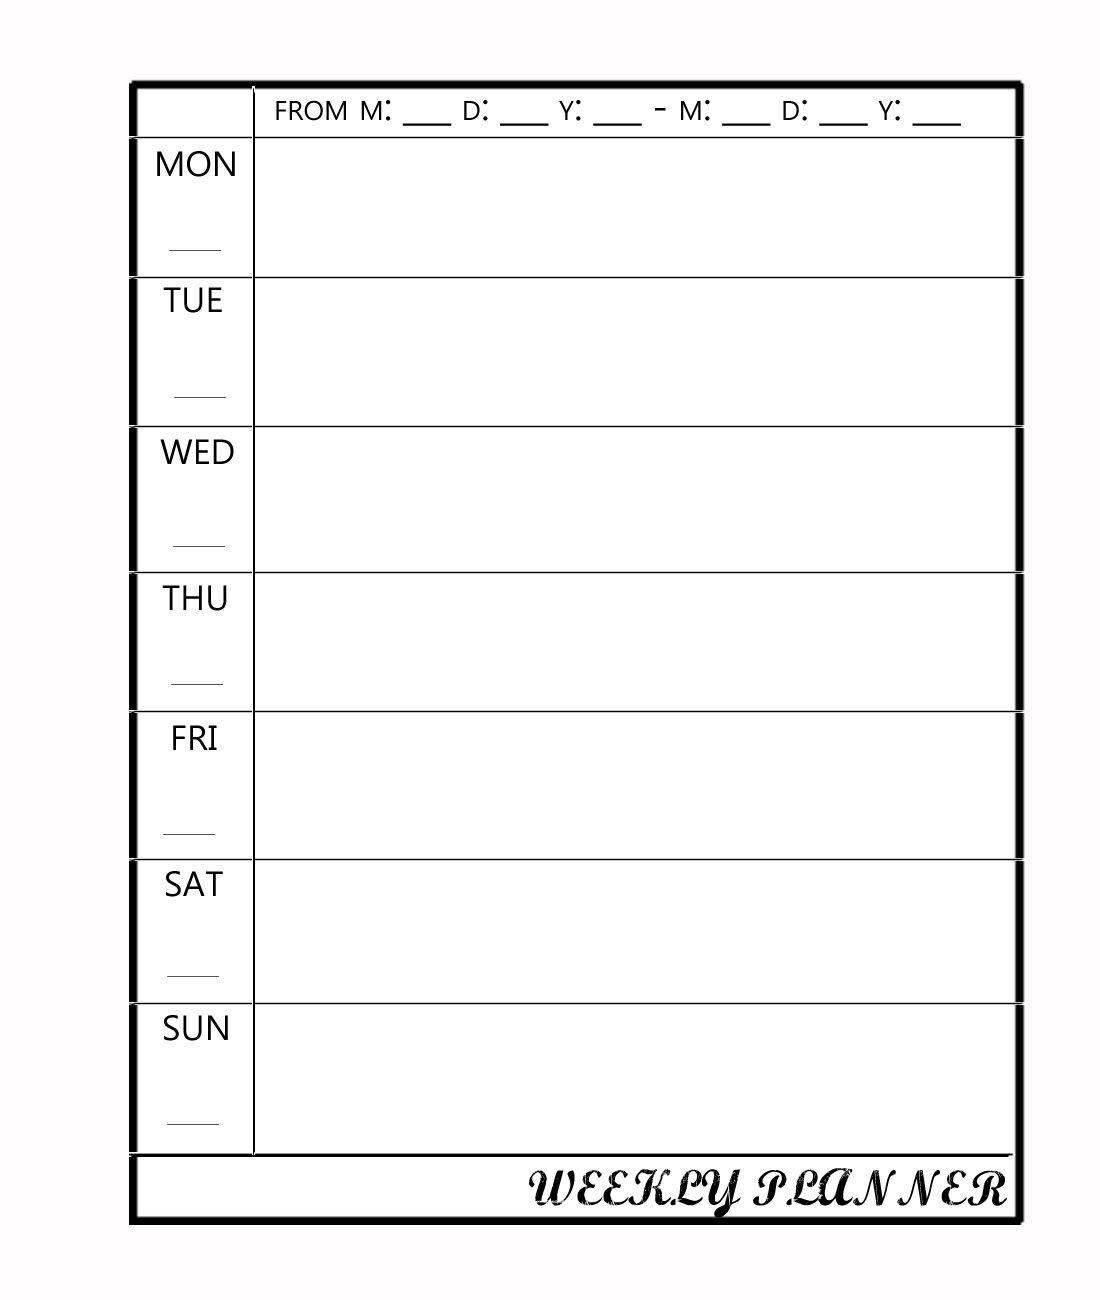 kerala kaumudi calendar 2018 pdf